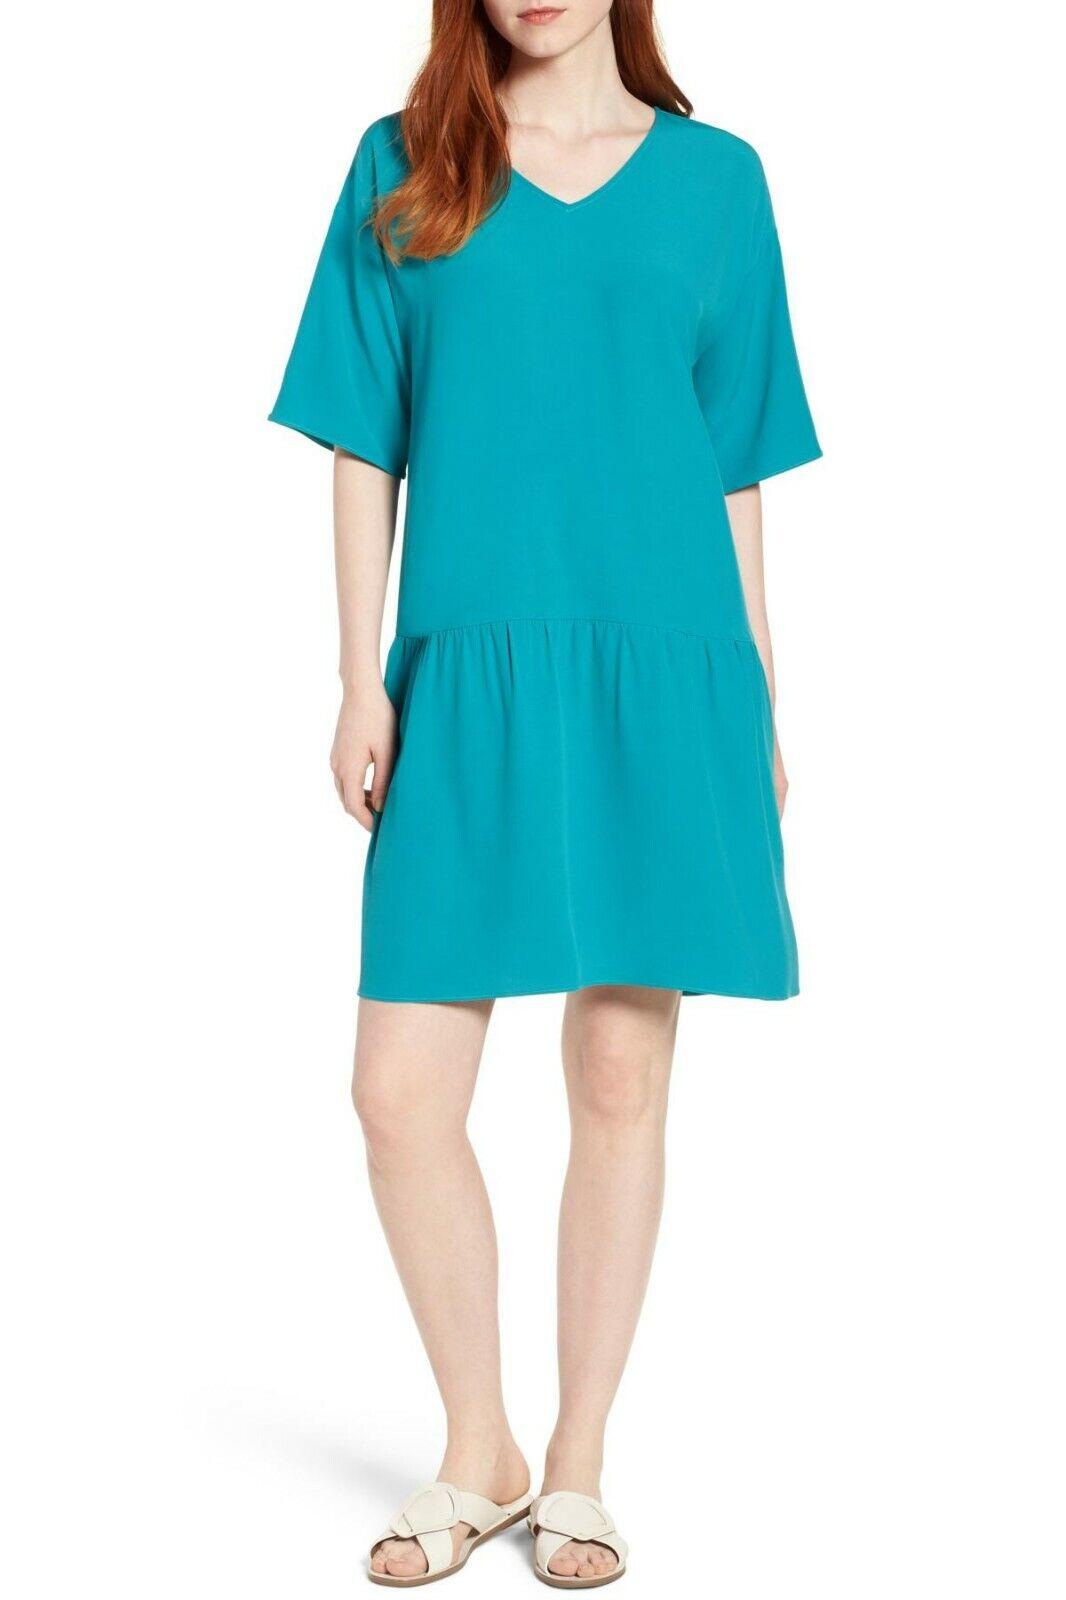 NWOT  Eileen Fisher Tencel Crepe Drop-Waist Dress